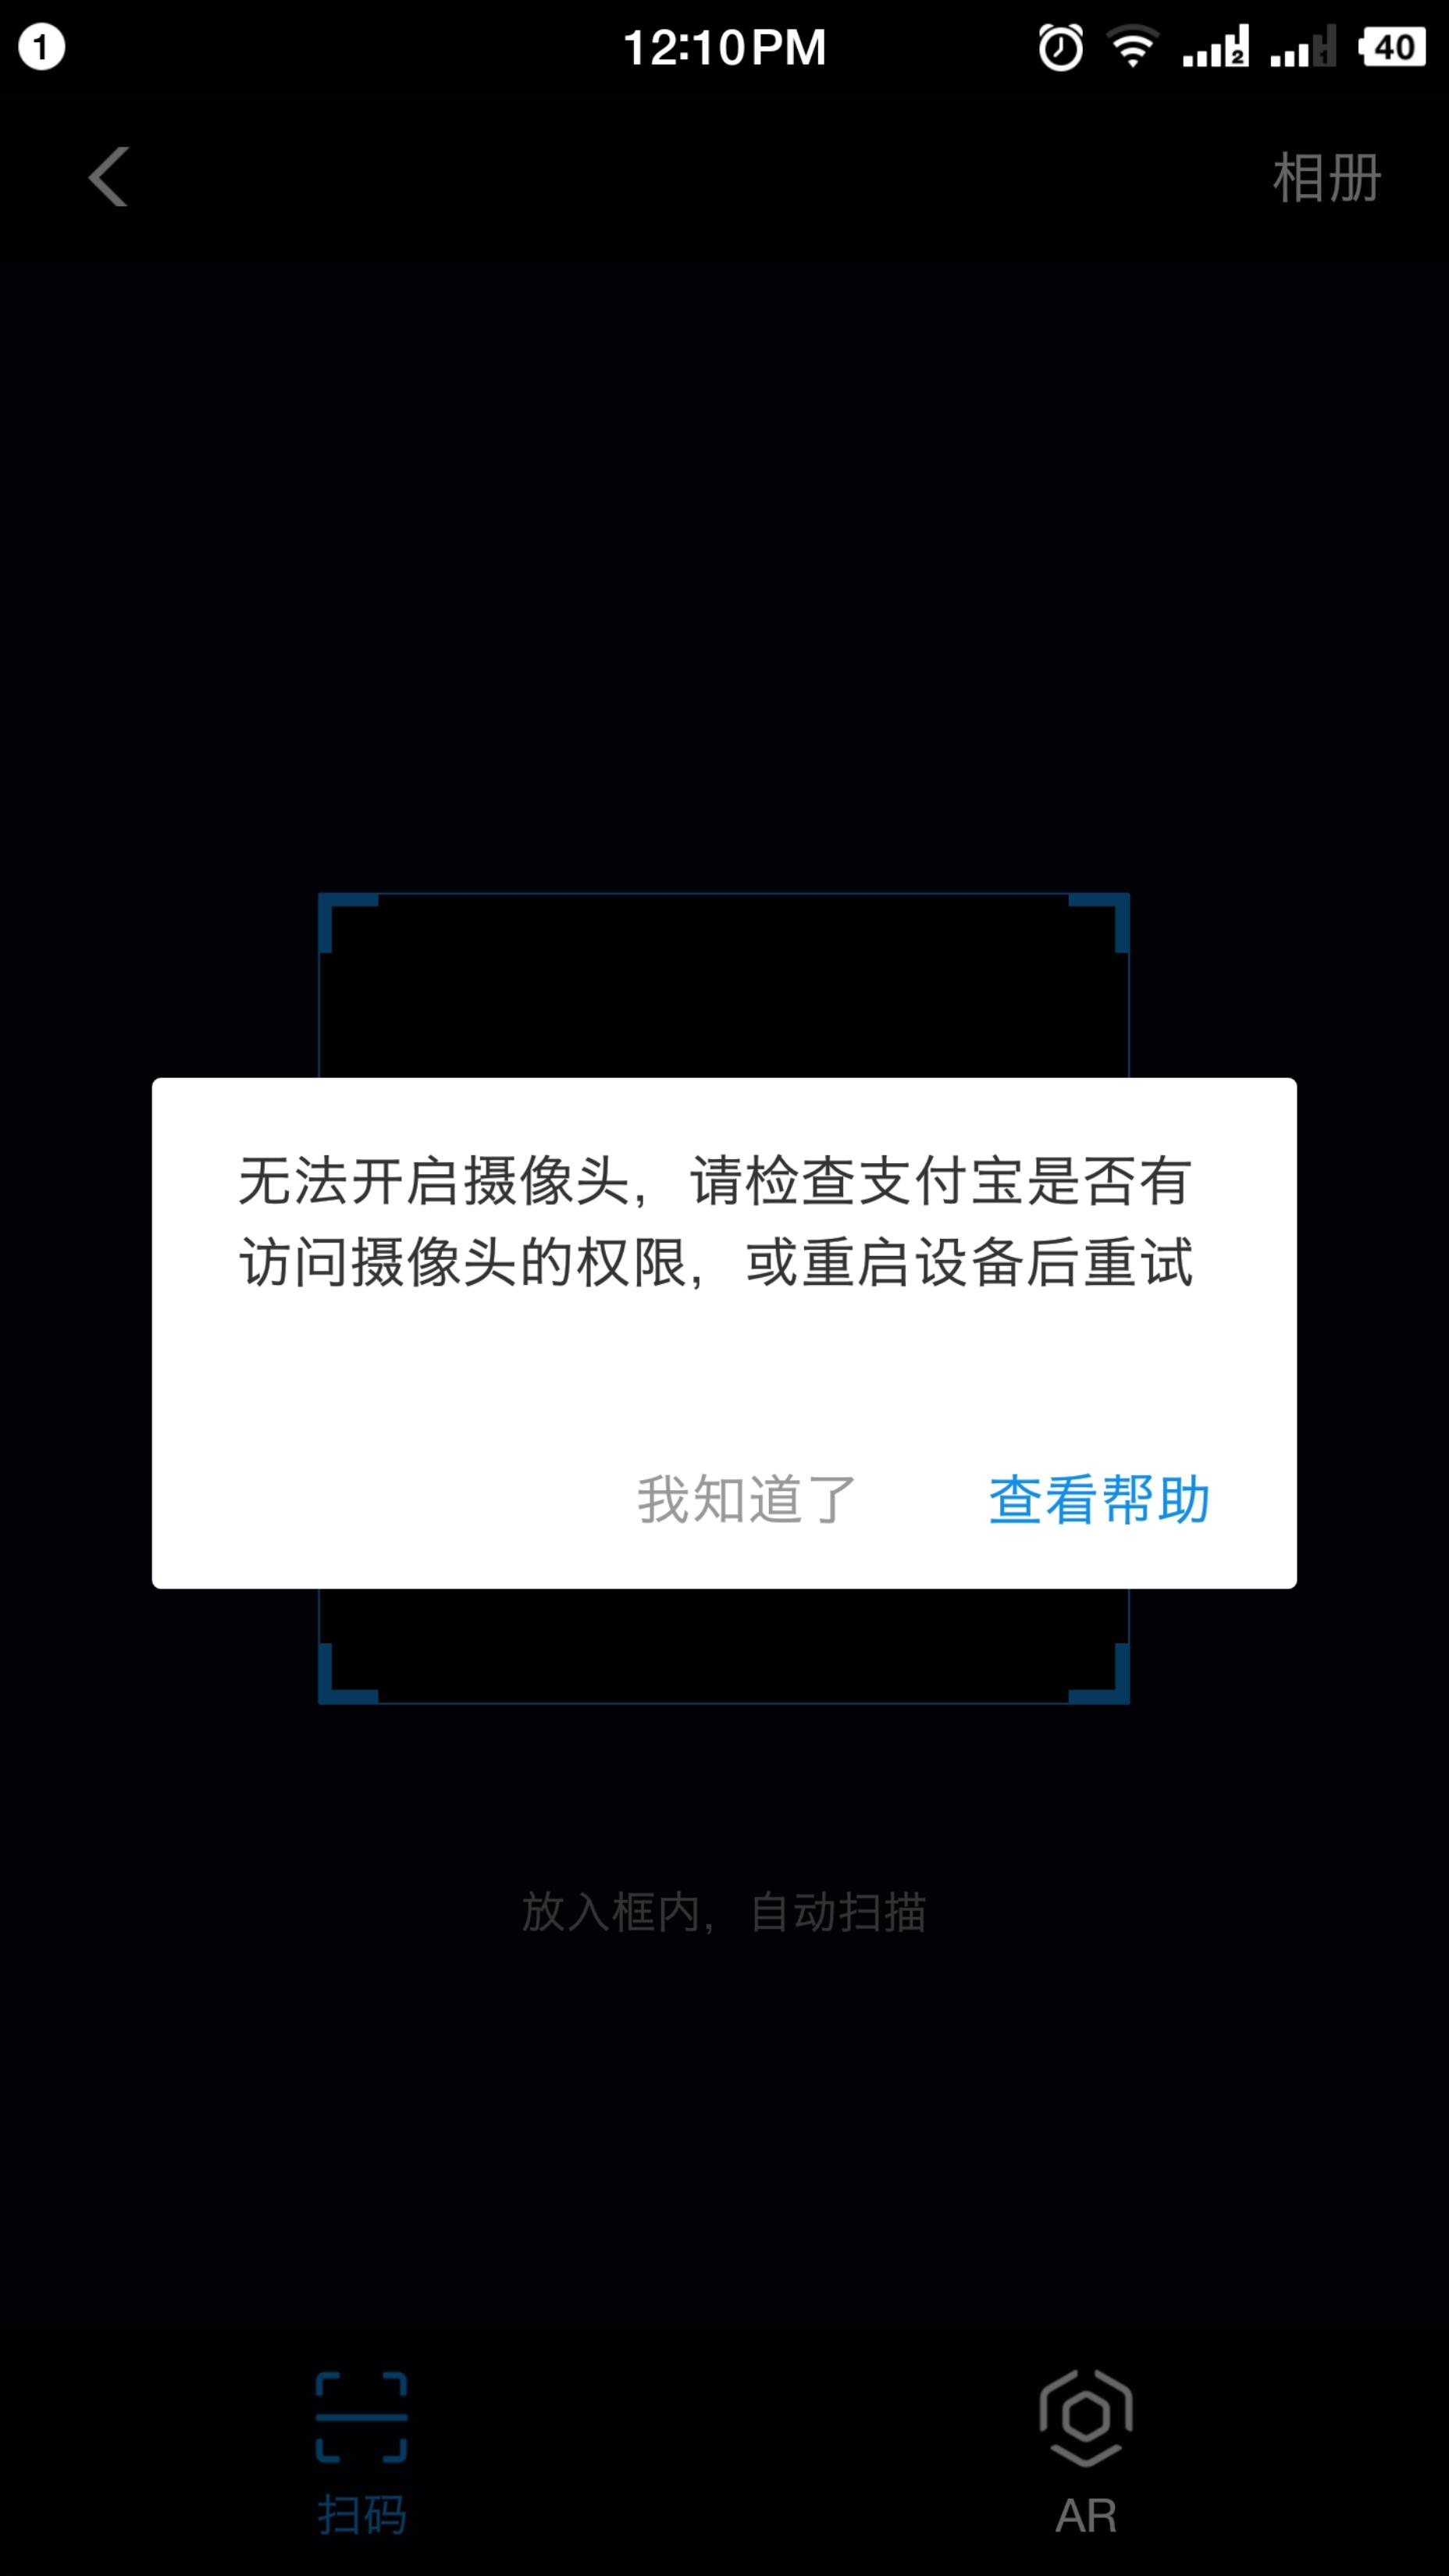 screenshot_2018-11-09-12-10-20-275_???.png